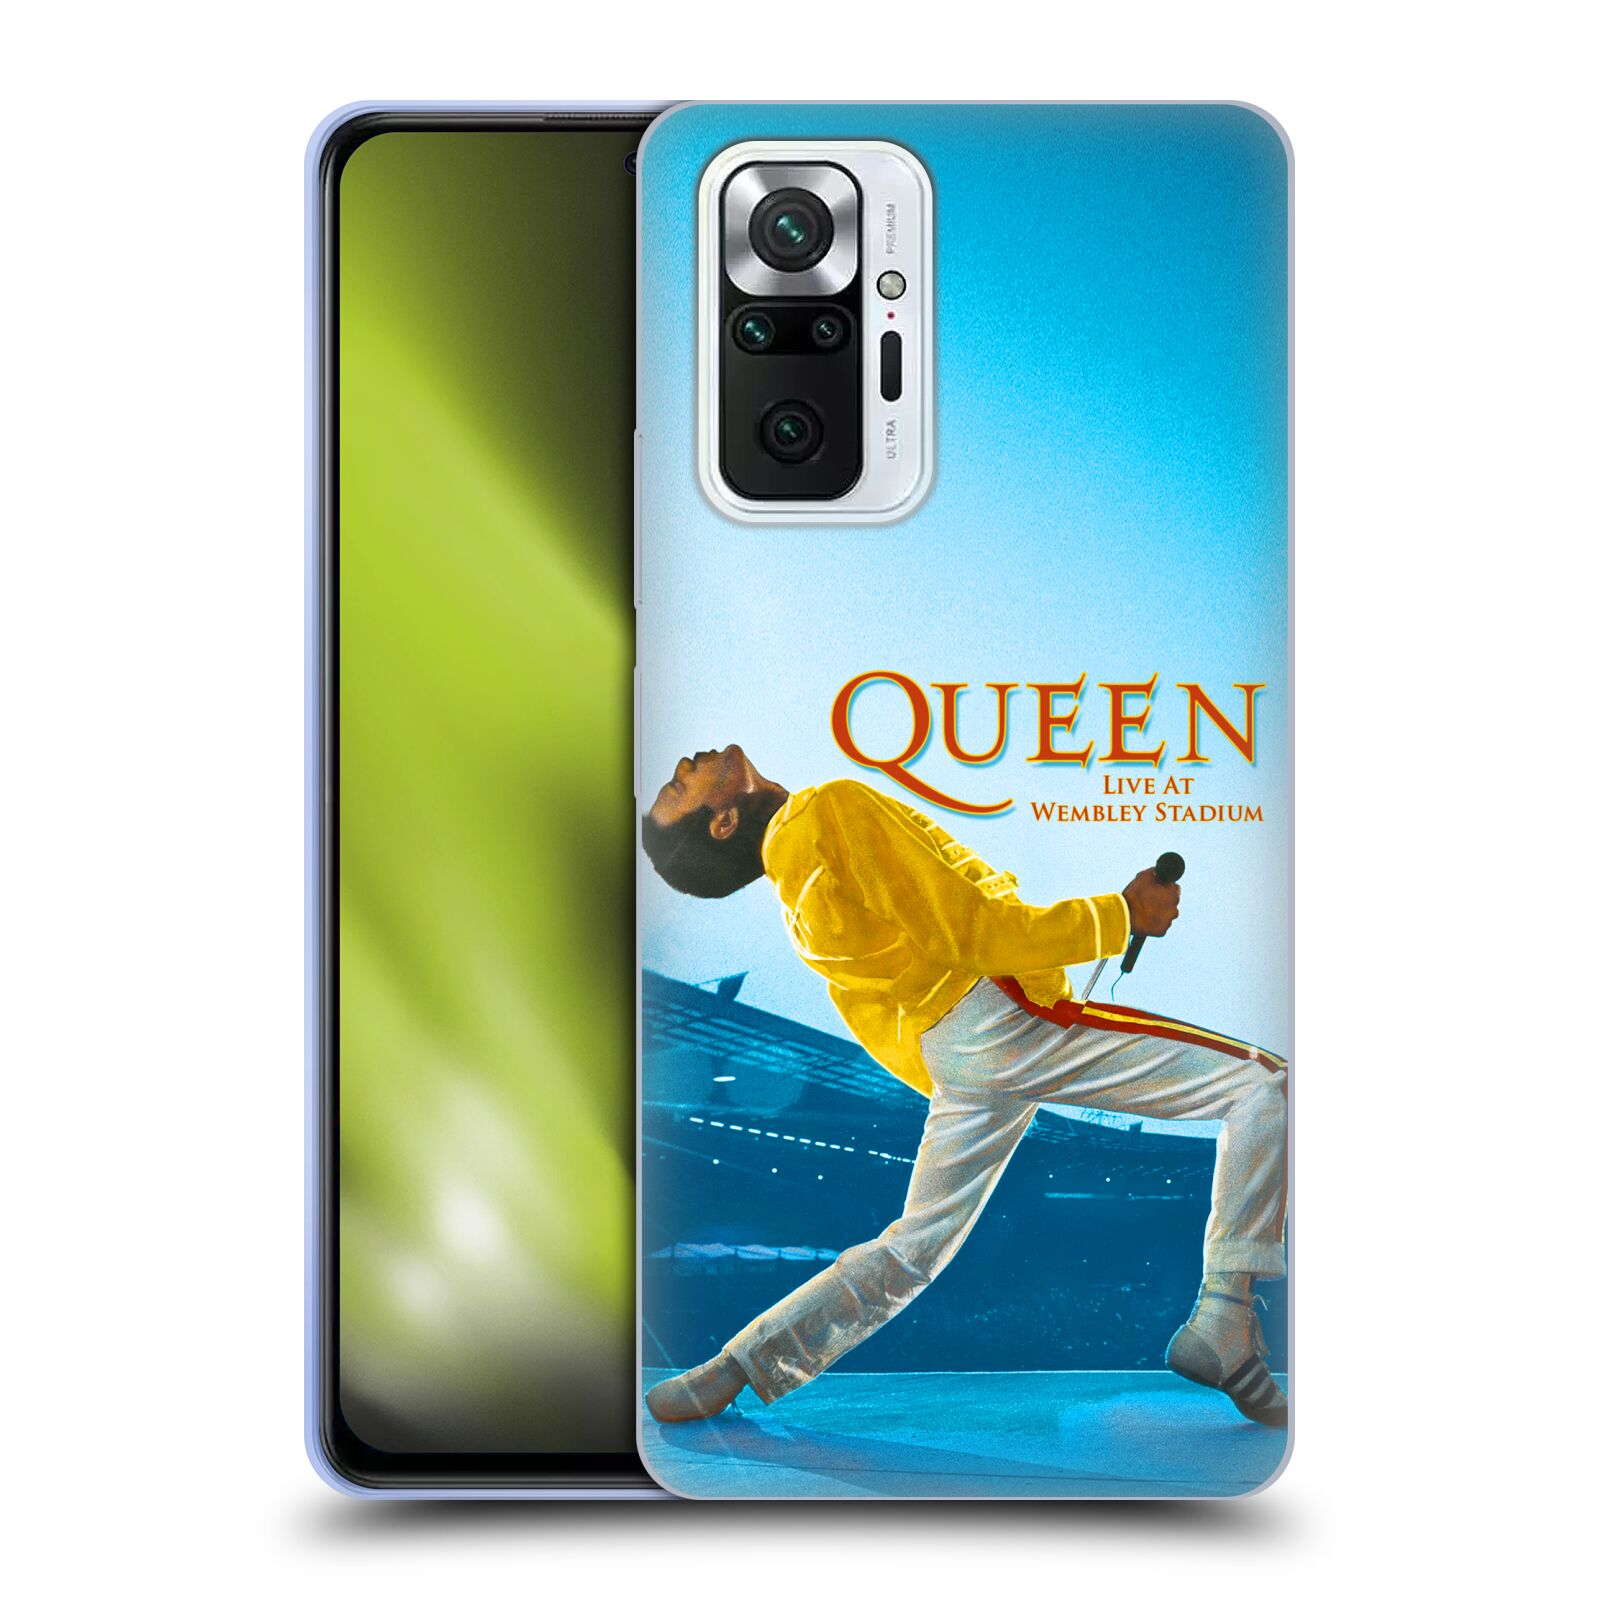 Silikonové pouzdro na mobil Xiaomi Redmi Note 10 Pro - Head Case - Queen - Freddie Mercury